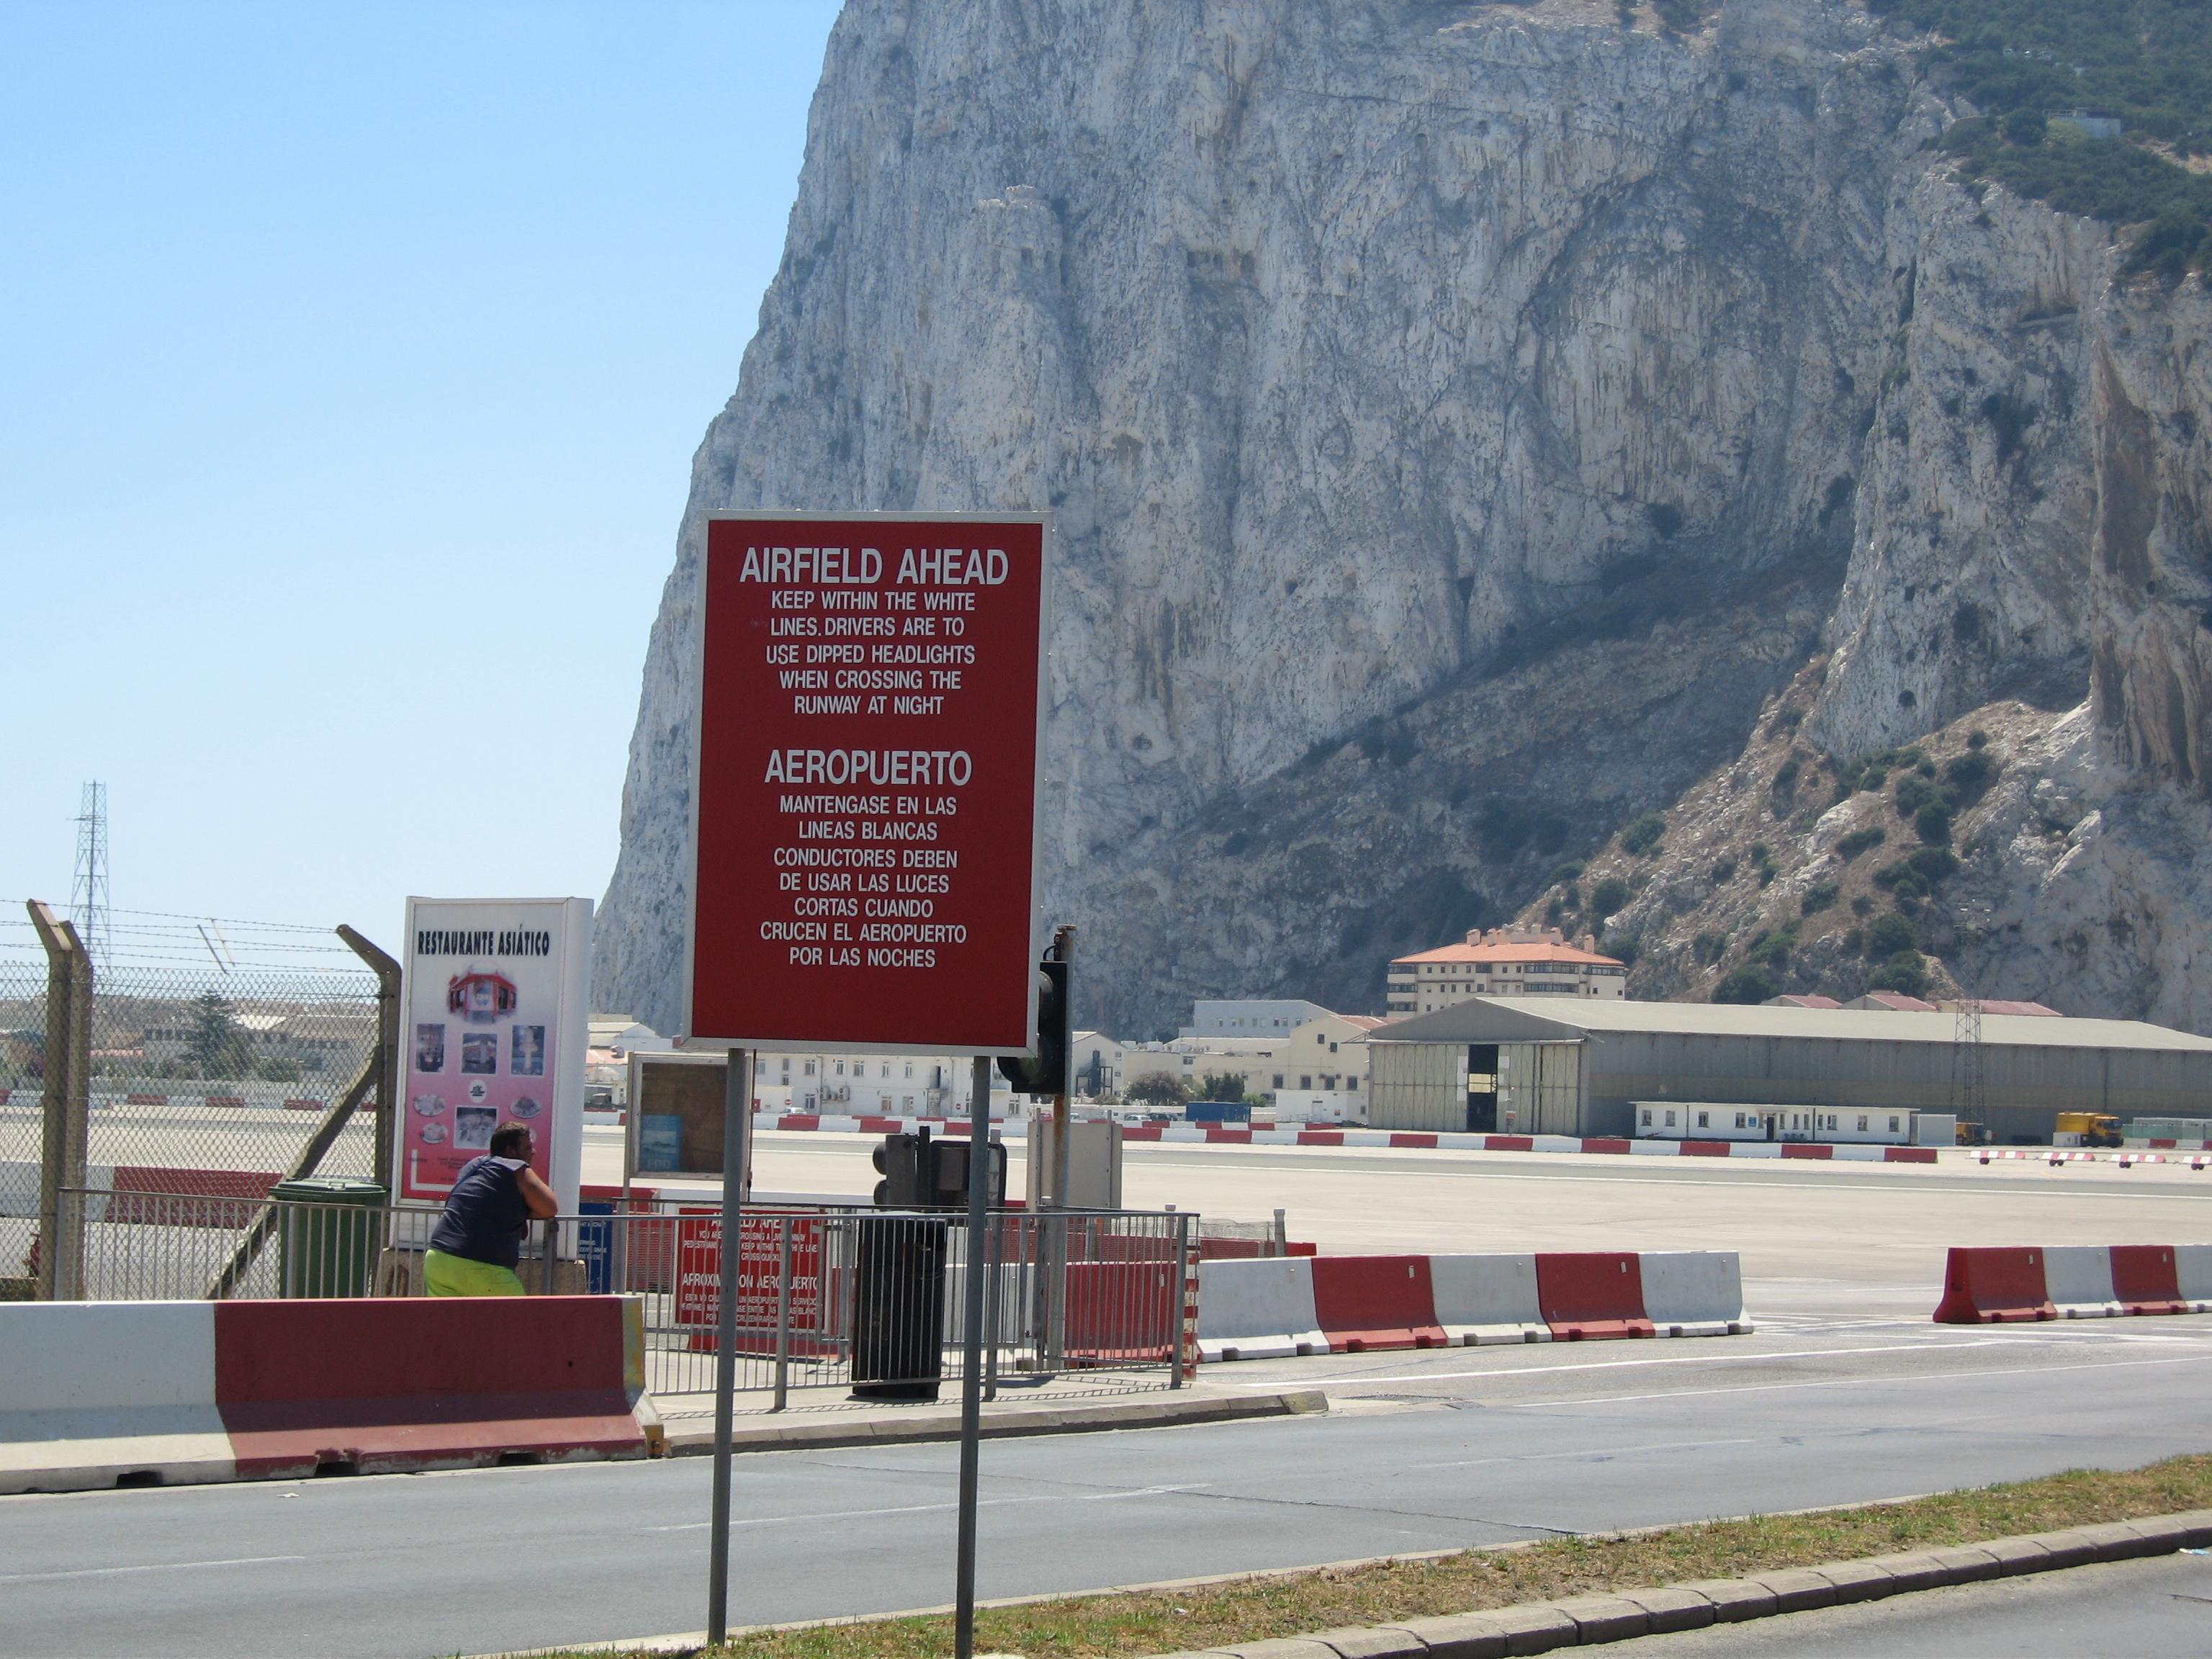 بالصور مطار جبل طارق , احدث صور لاكبر مطار في عالم 10676 6